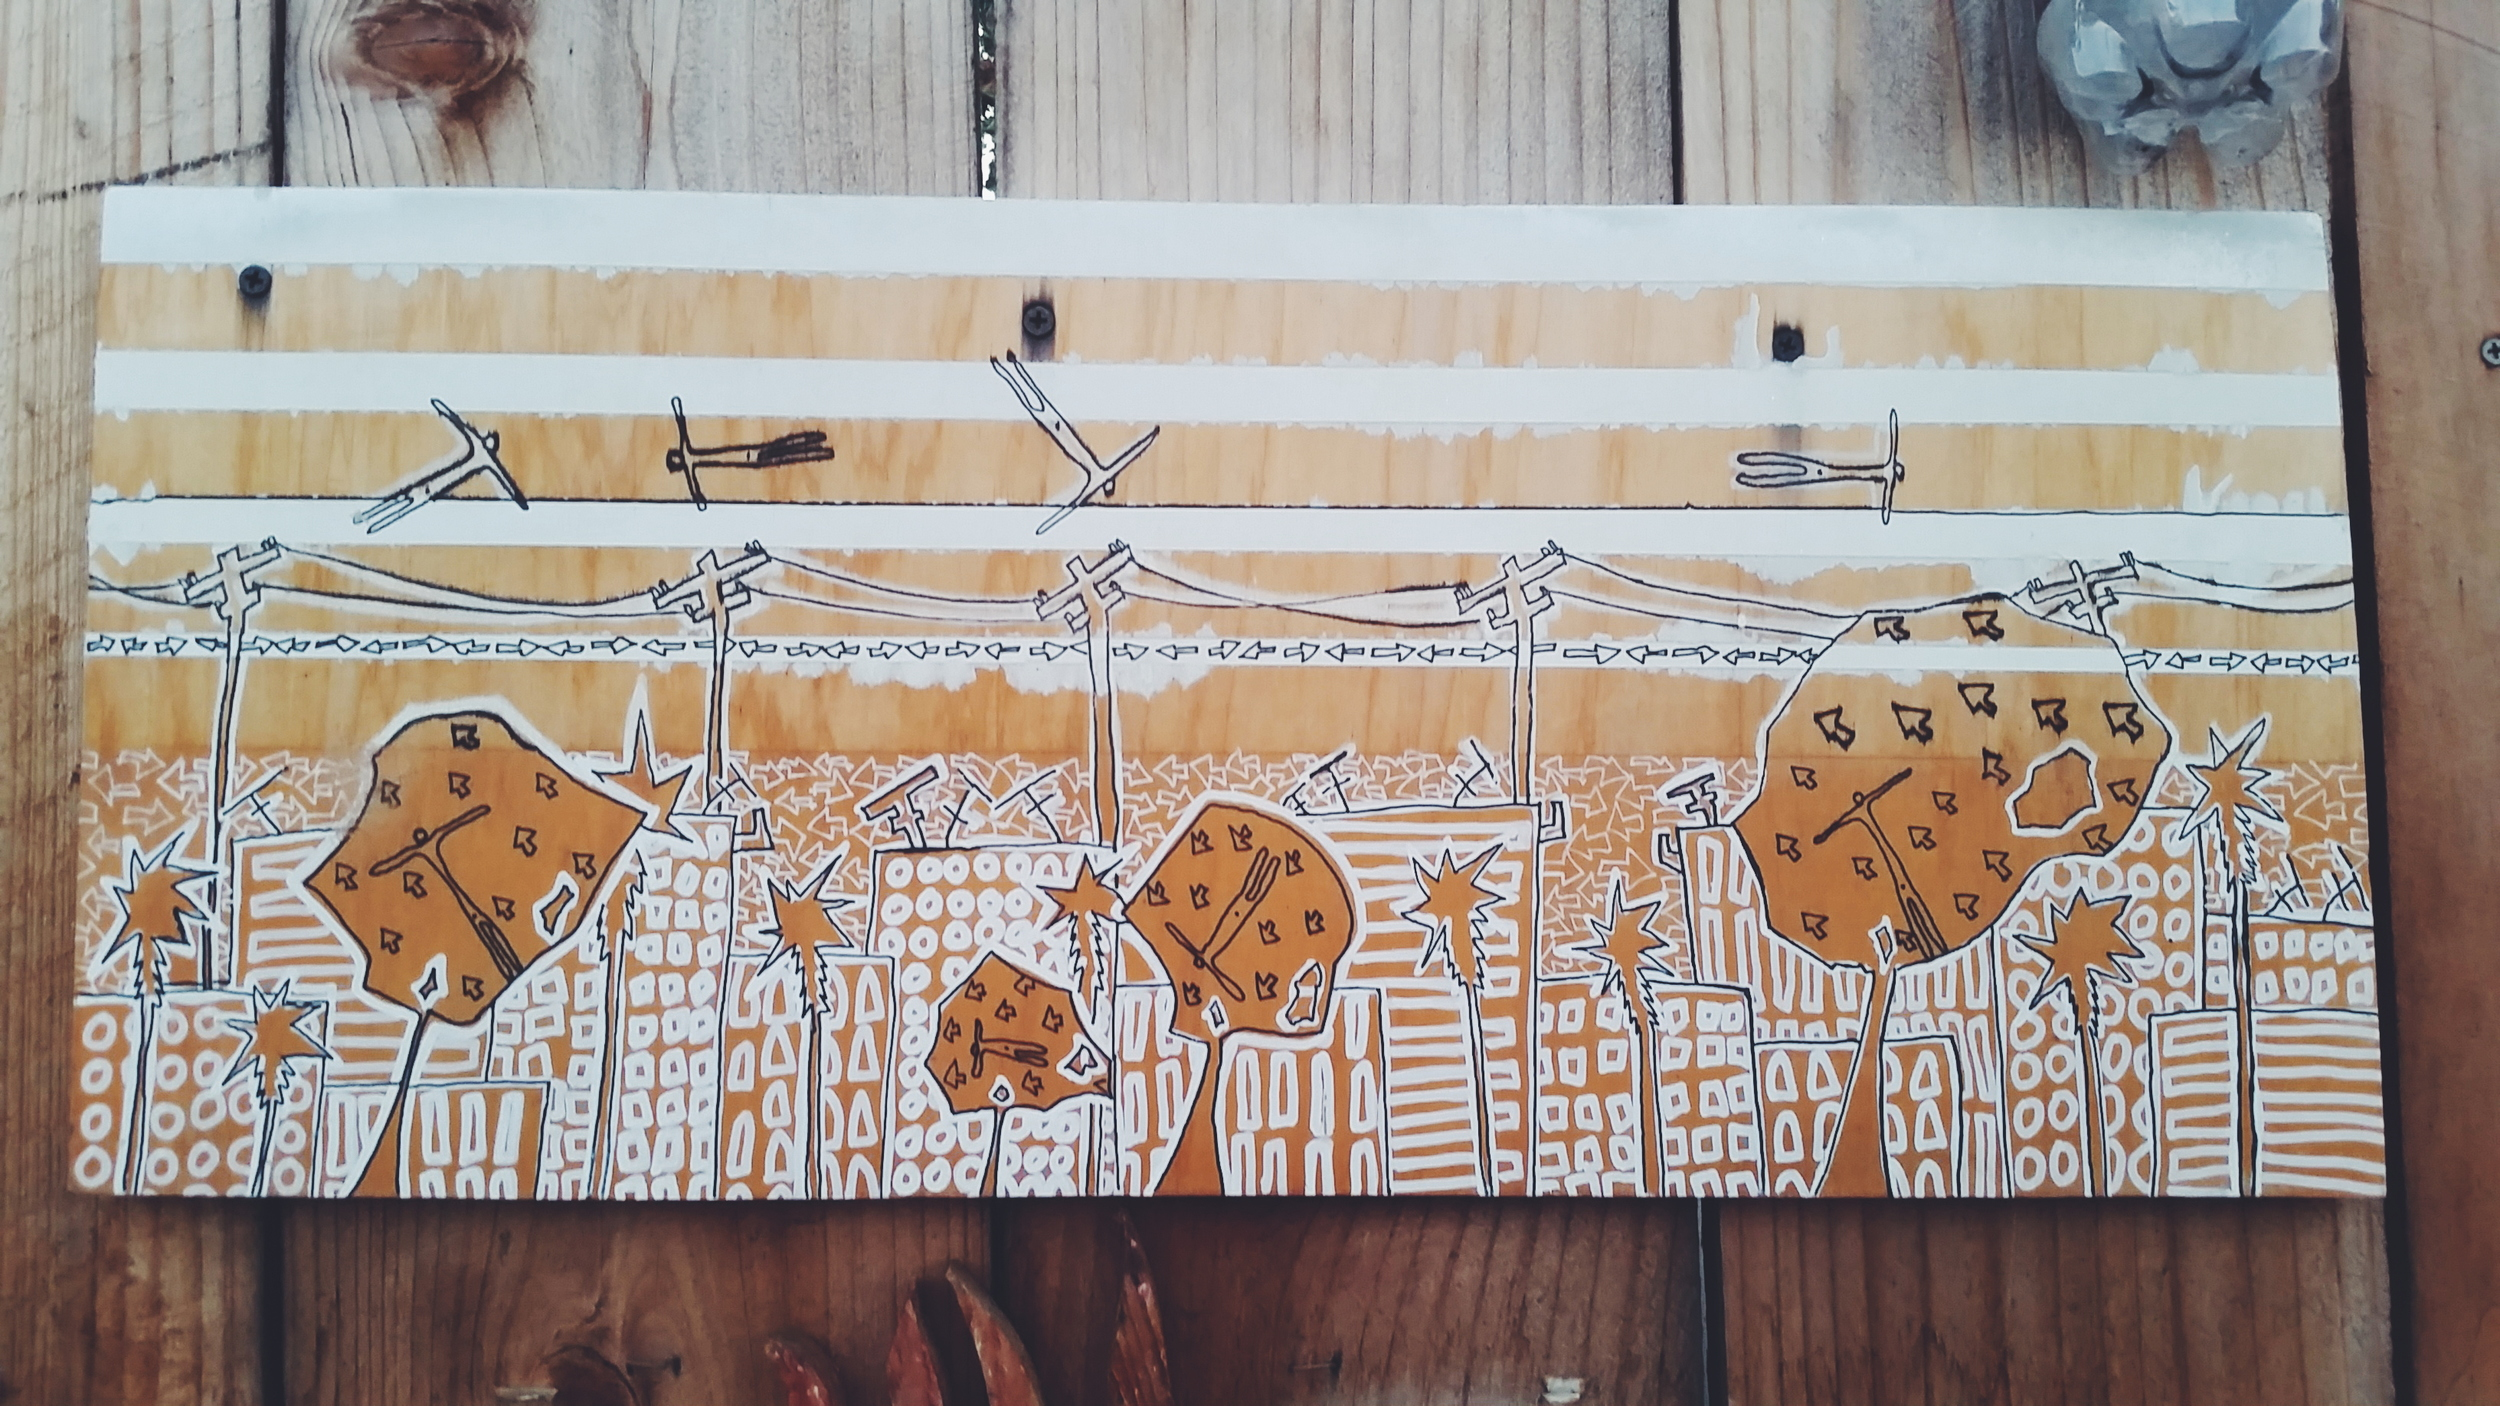 Santa Barbara street art.